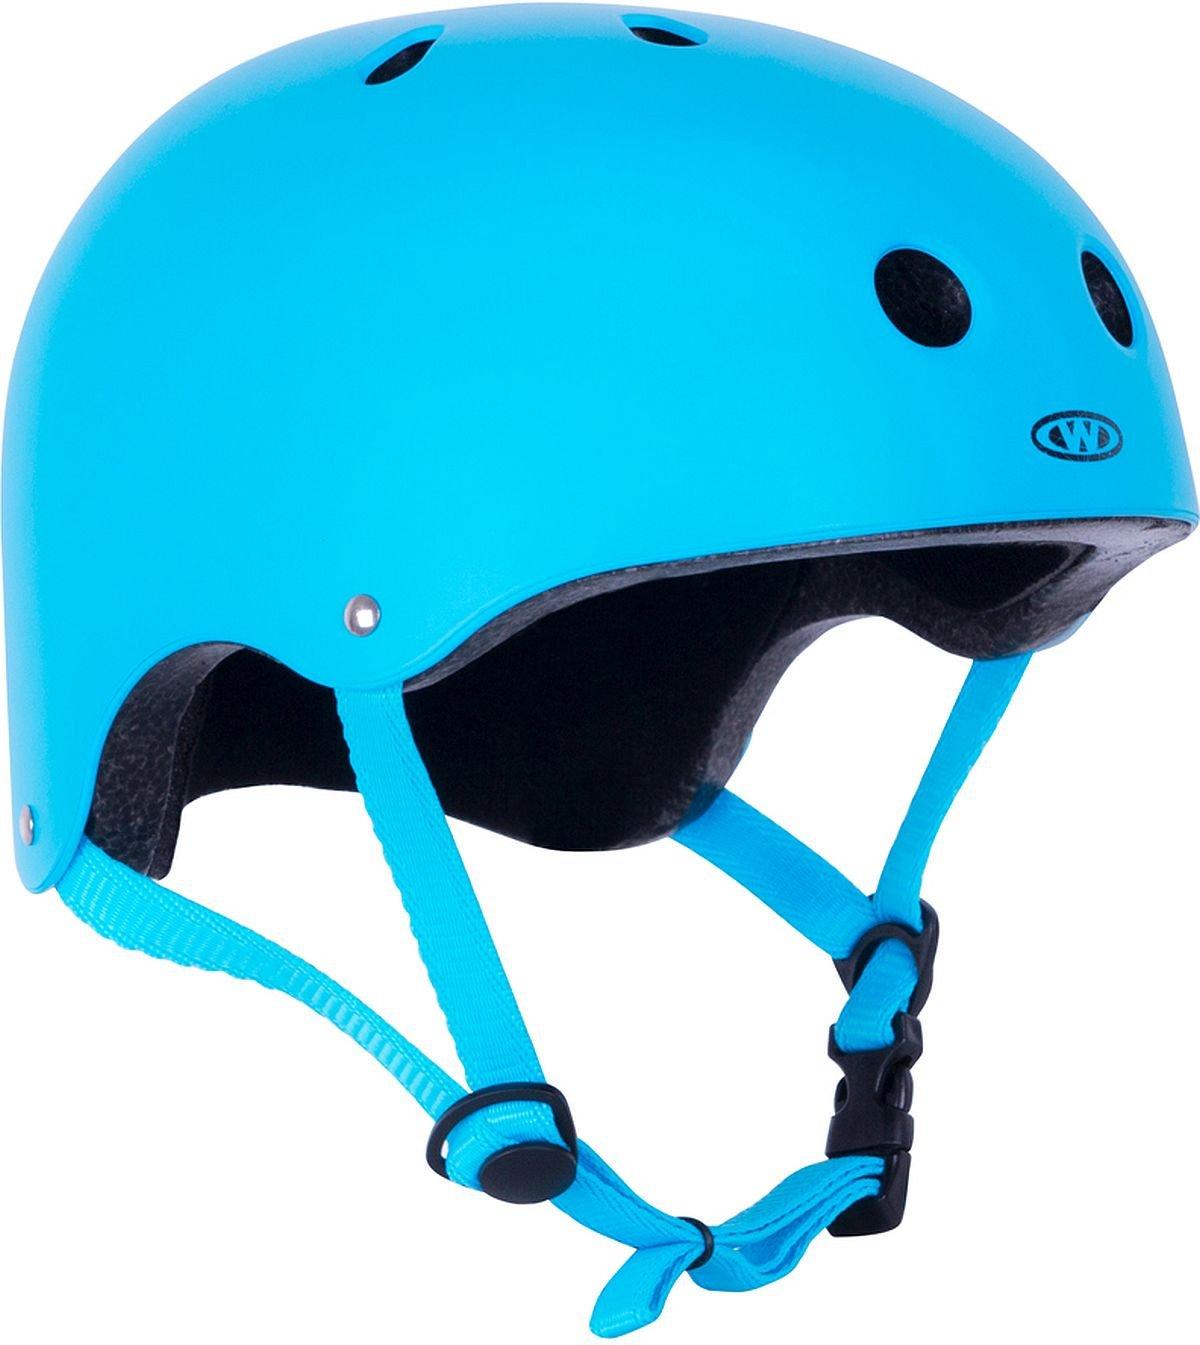 Skaterhelm Neonik blau Gr. 49-53, 53-56, 56-59, 59-62 cm verstellbar Insportline